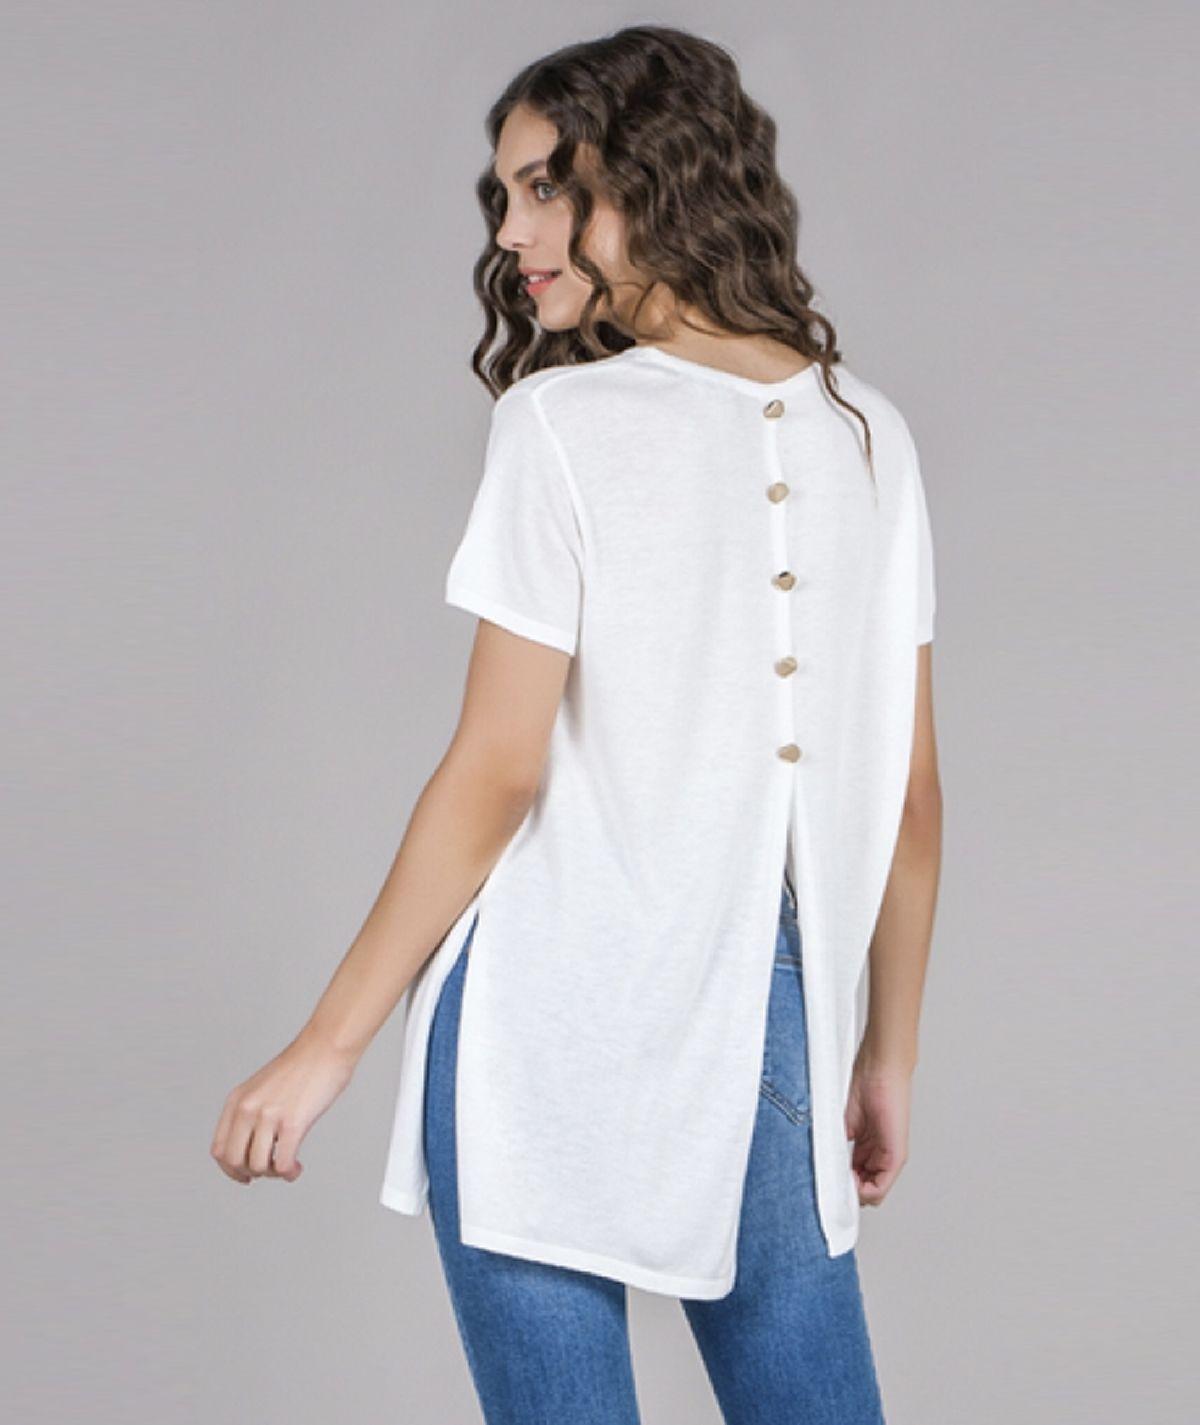 [CHIESSY] Camisola botões